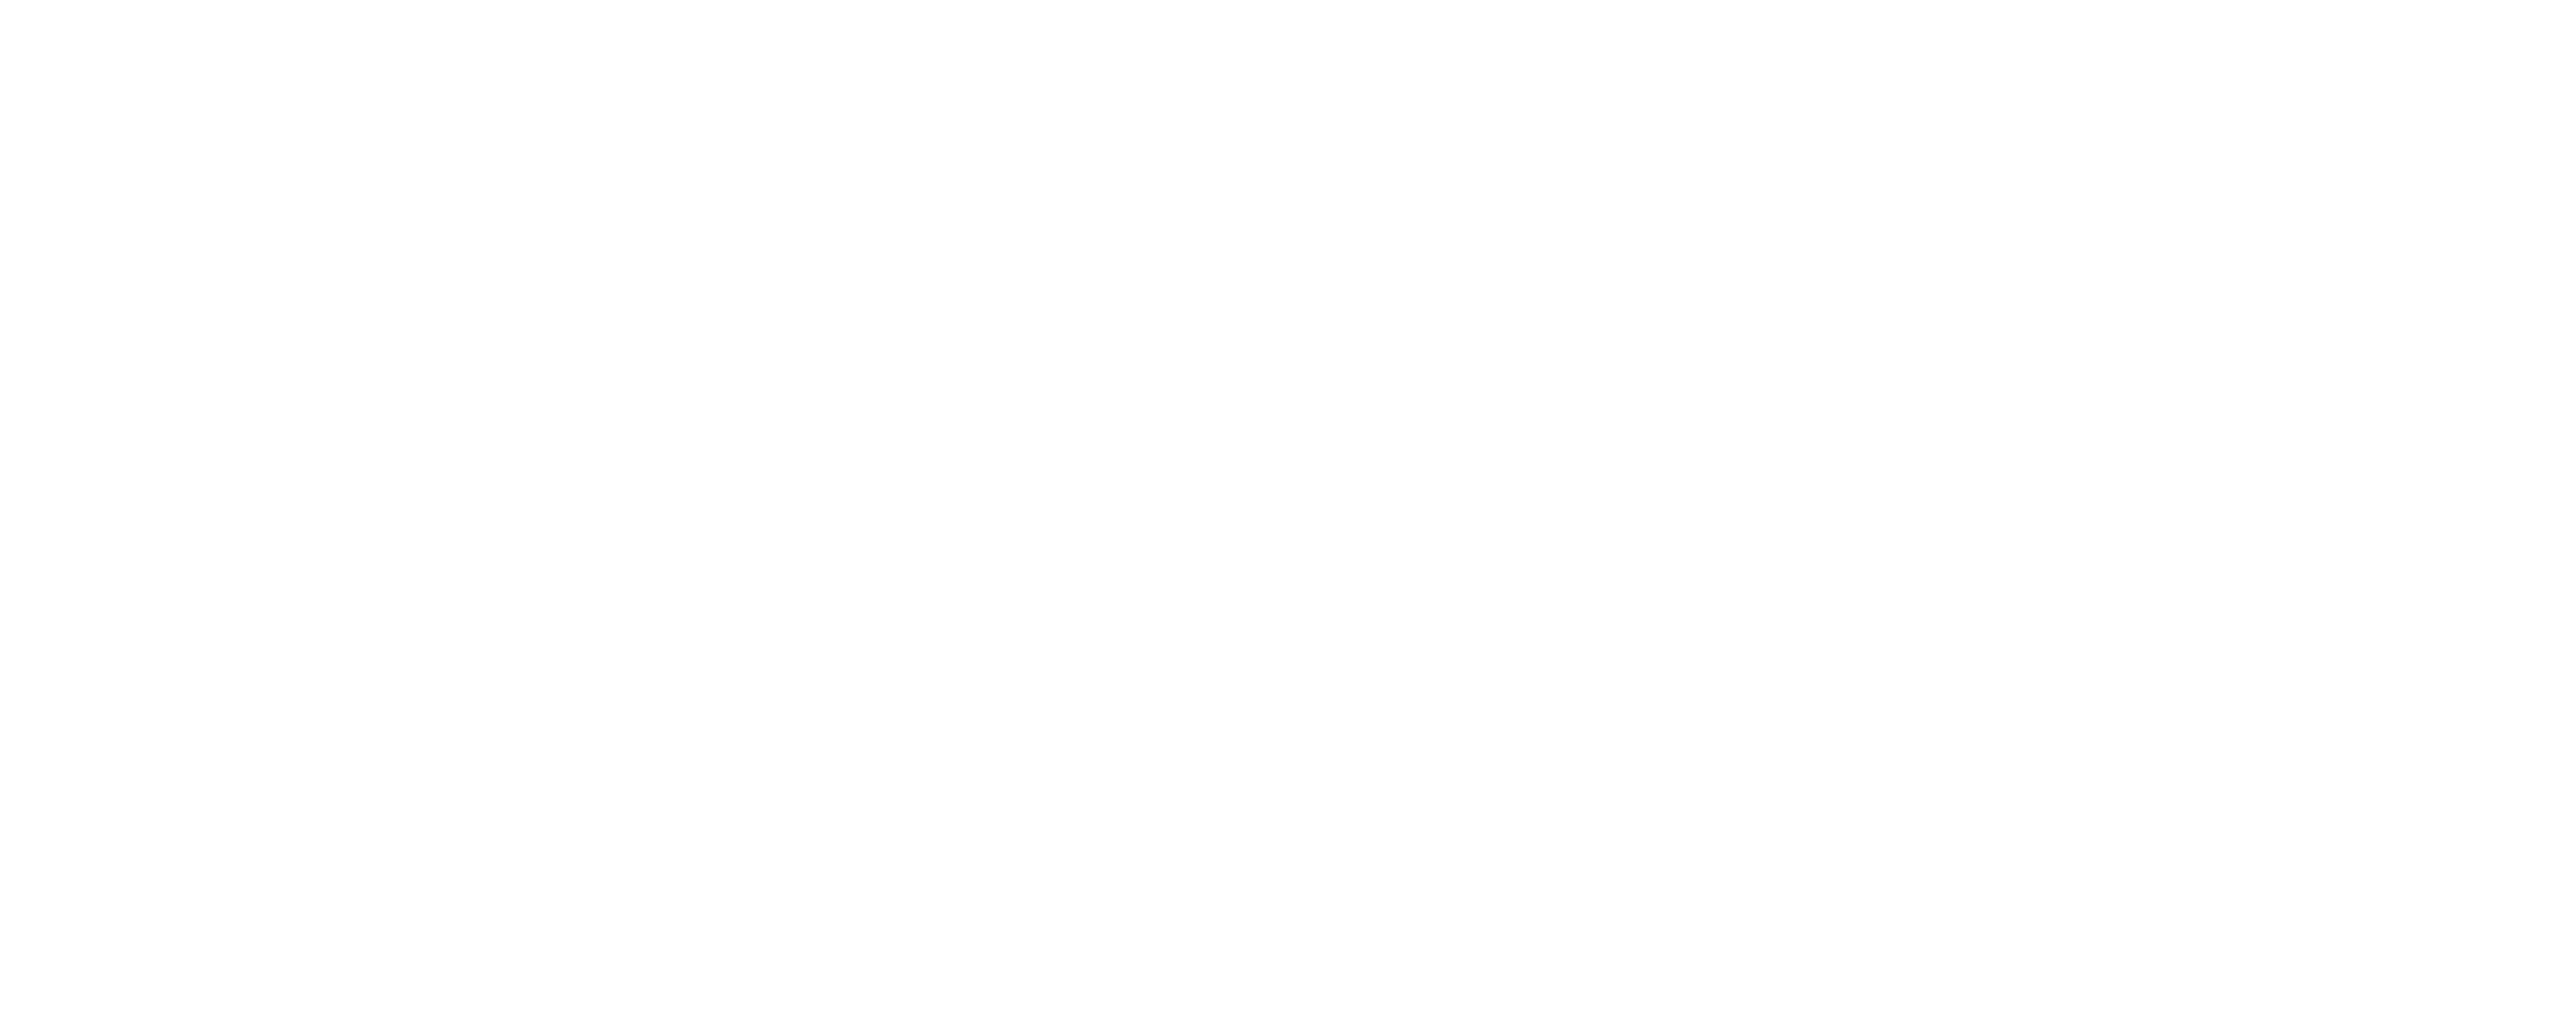 365 Agency